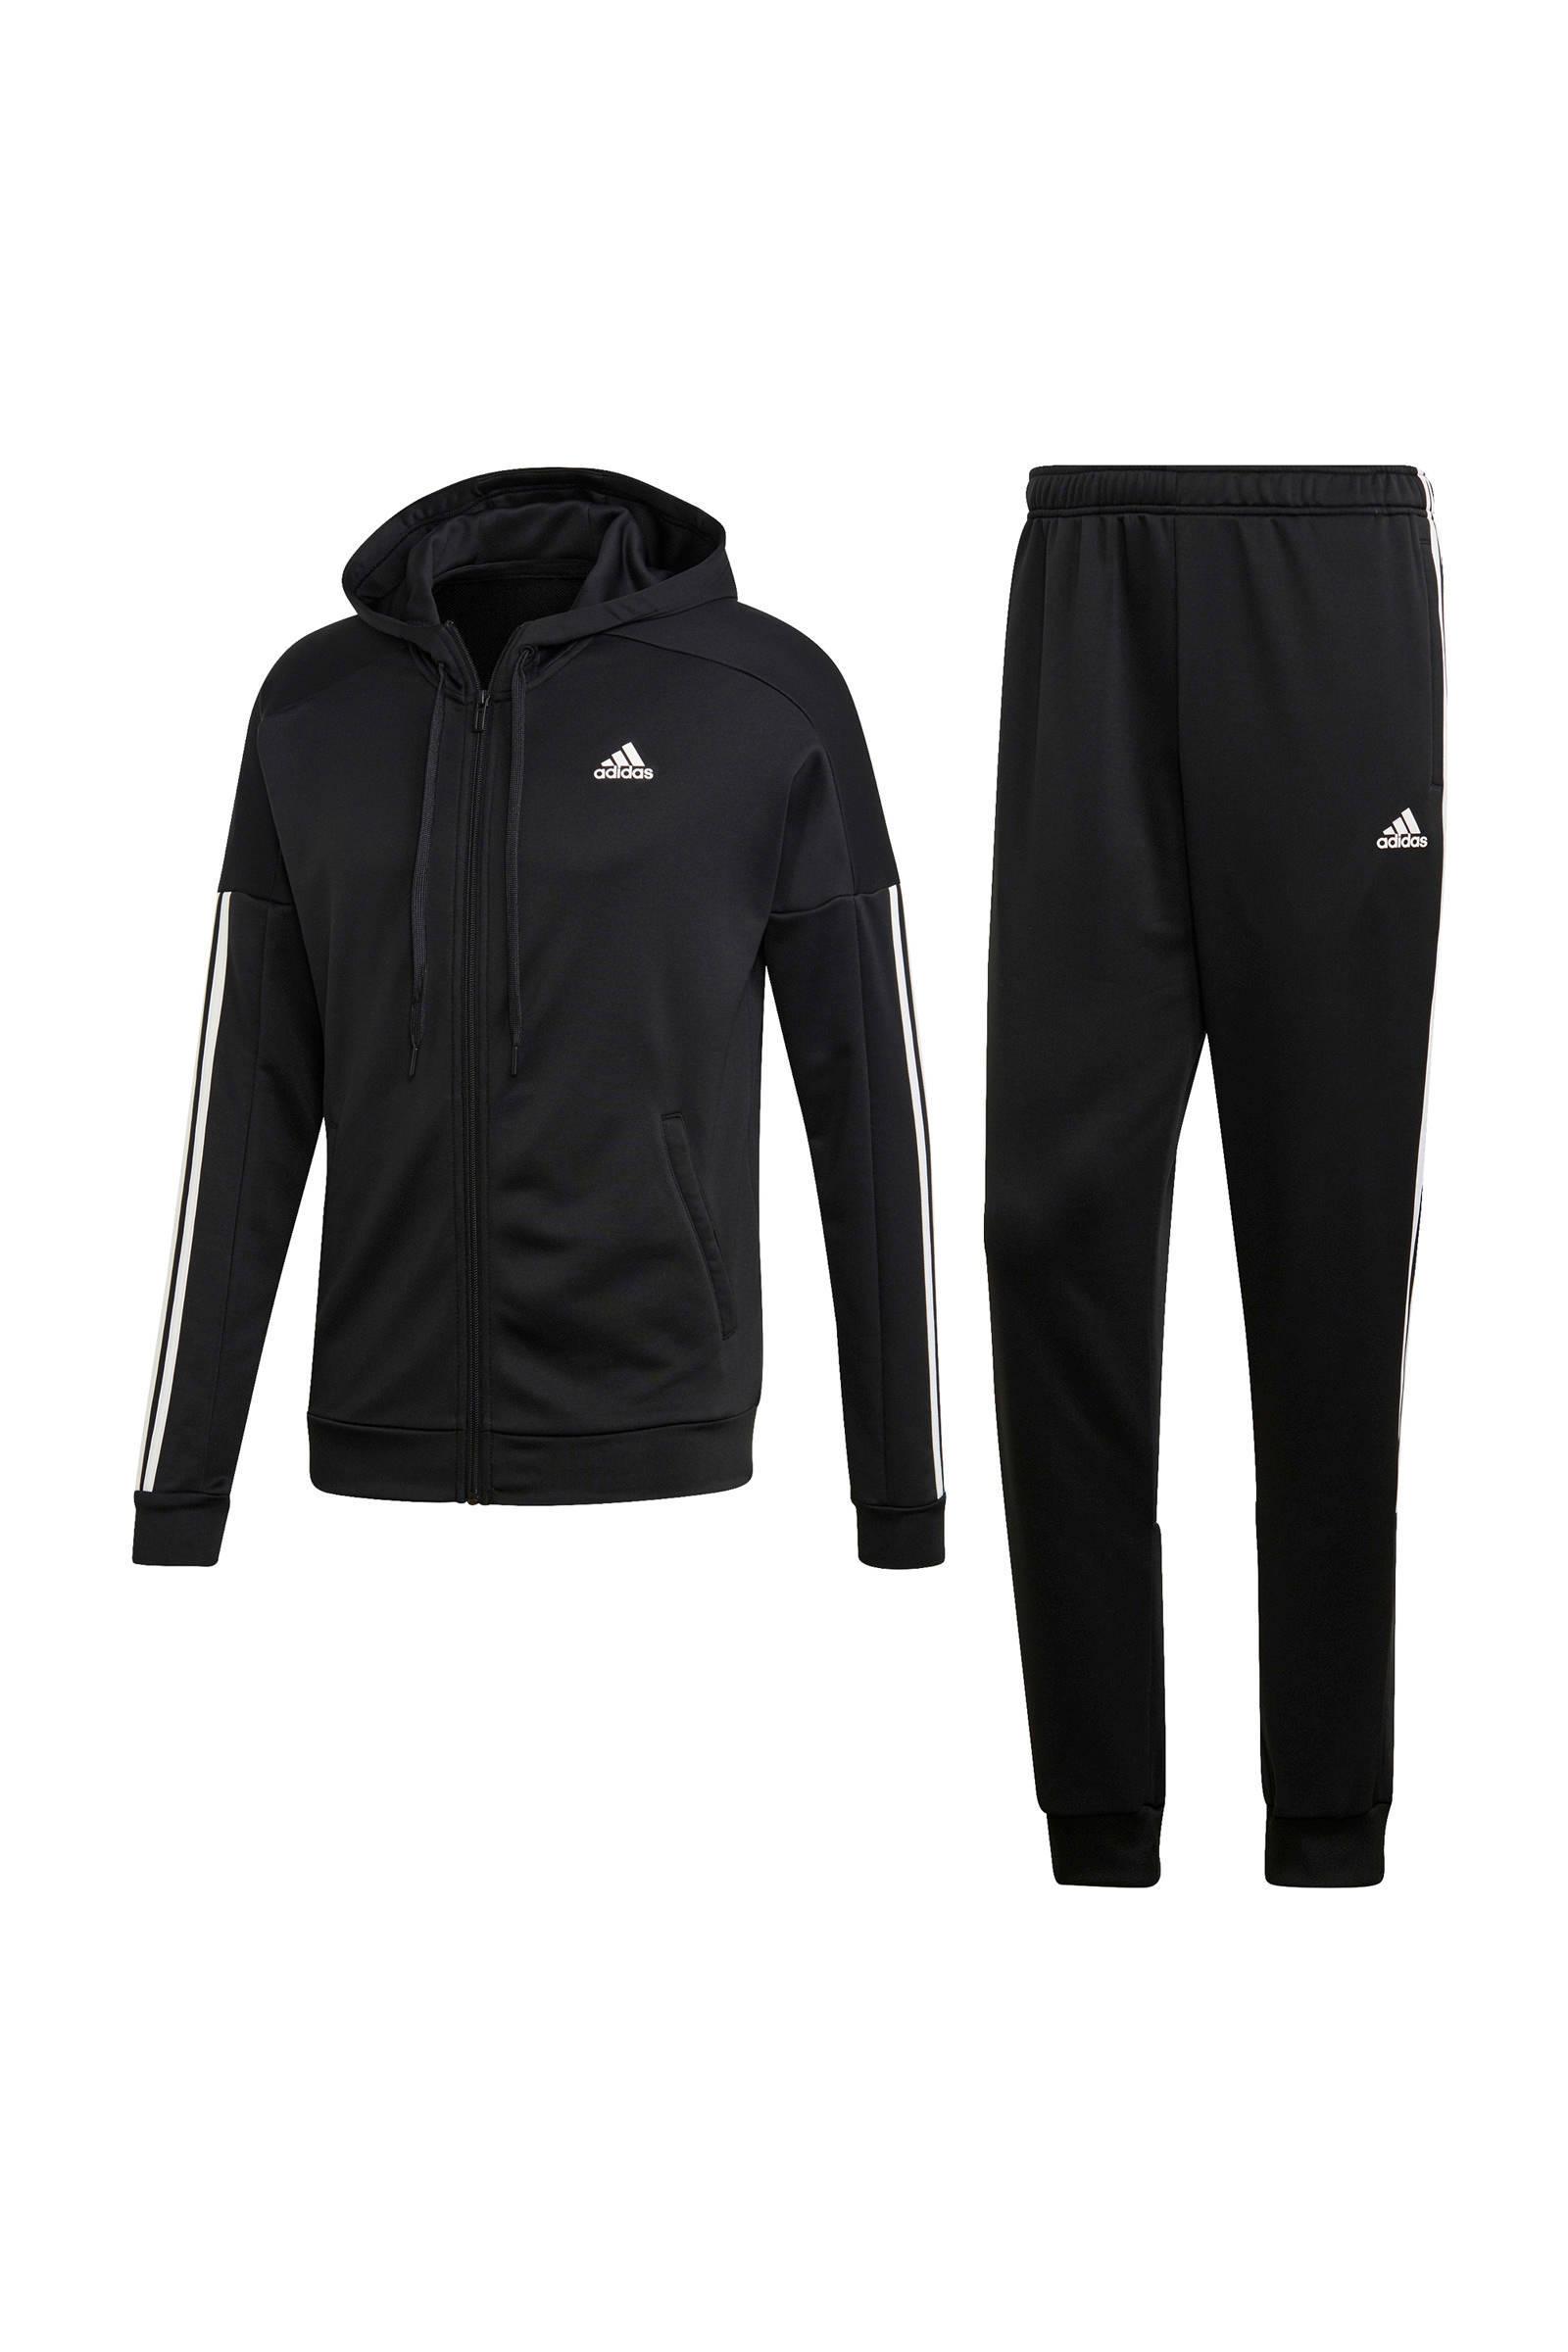 adidas performance trainingspak zwart/wit | wehkamp